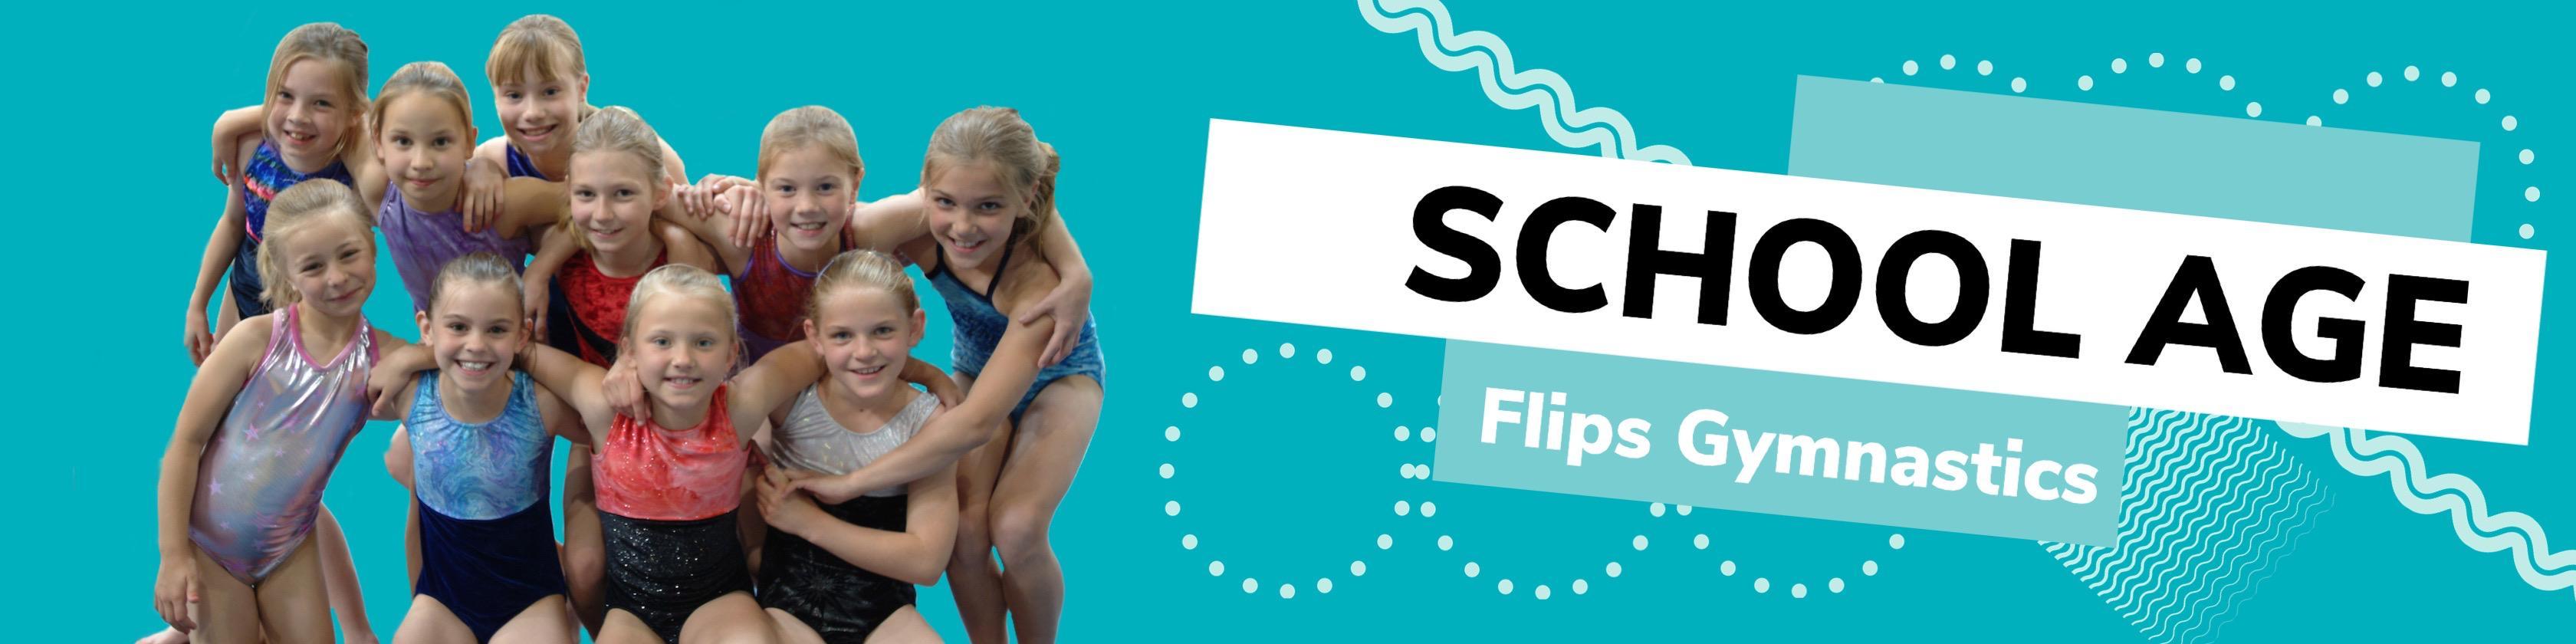 Flips Gymnastics School Age For All Minnesota